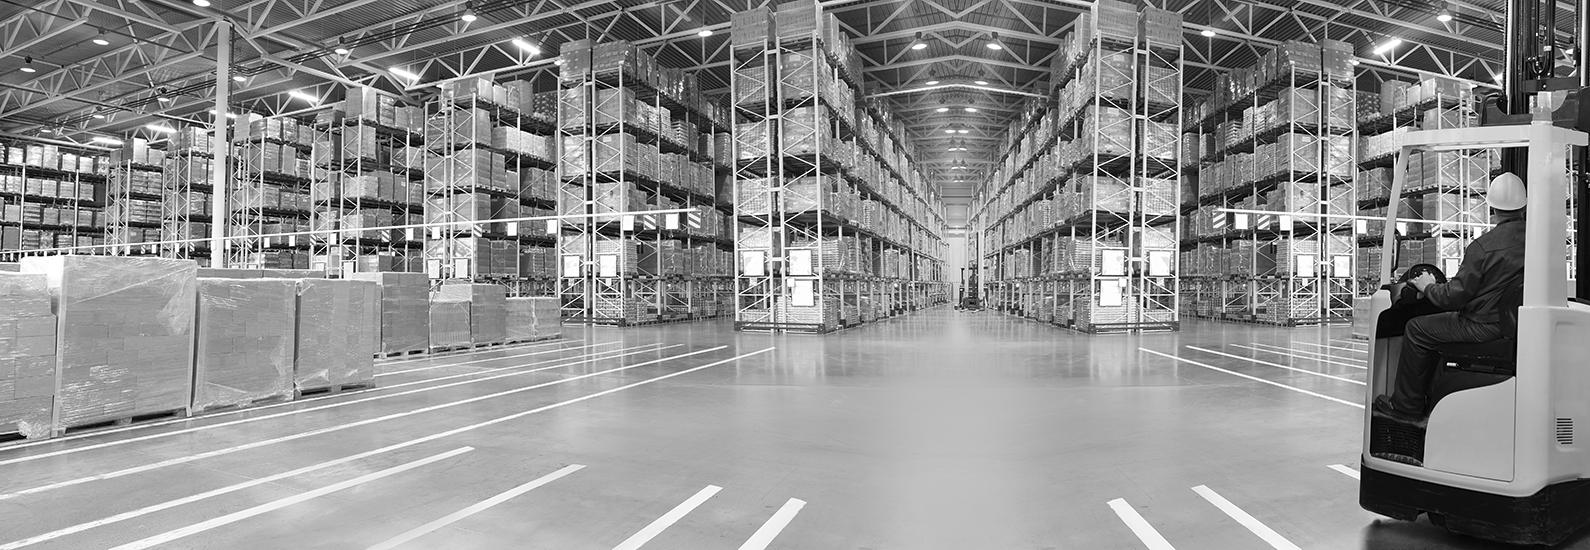 warehouse_shutterstock_b&w.png